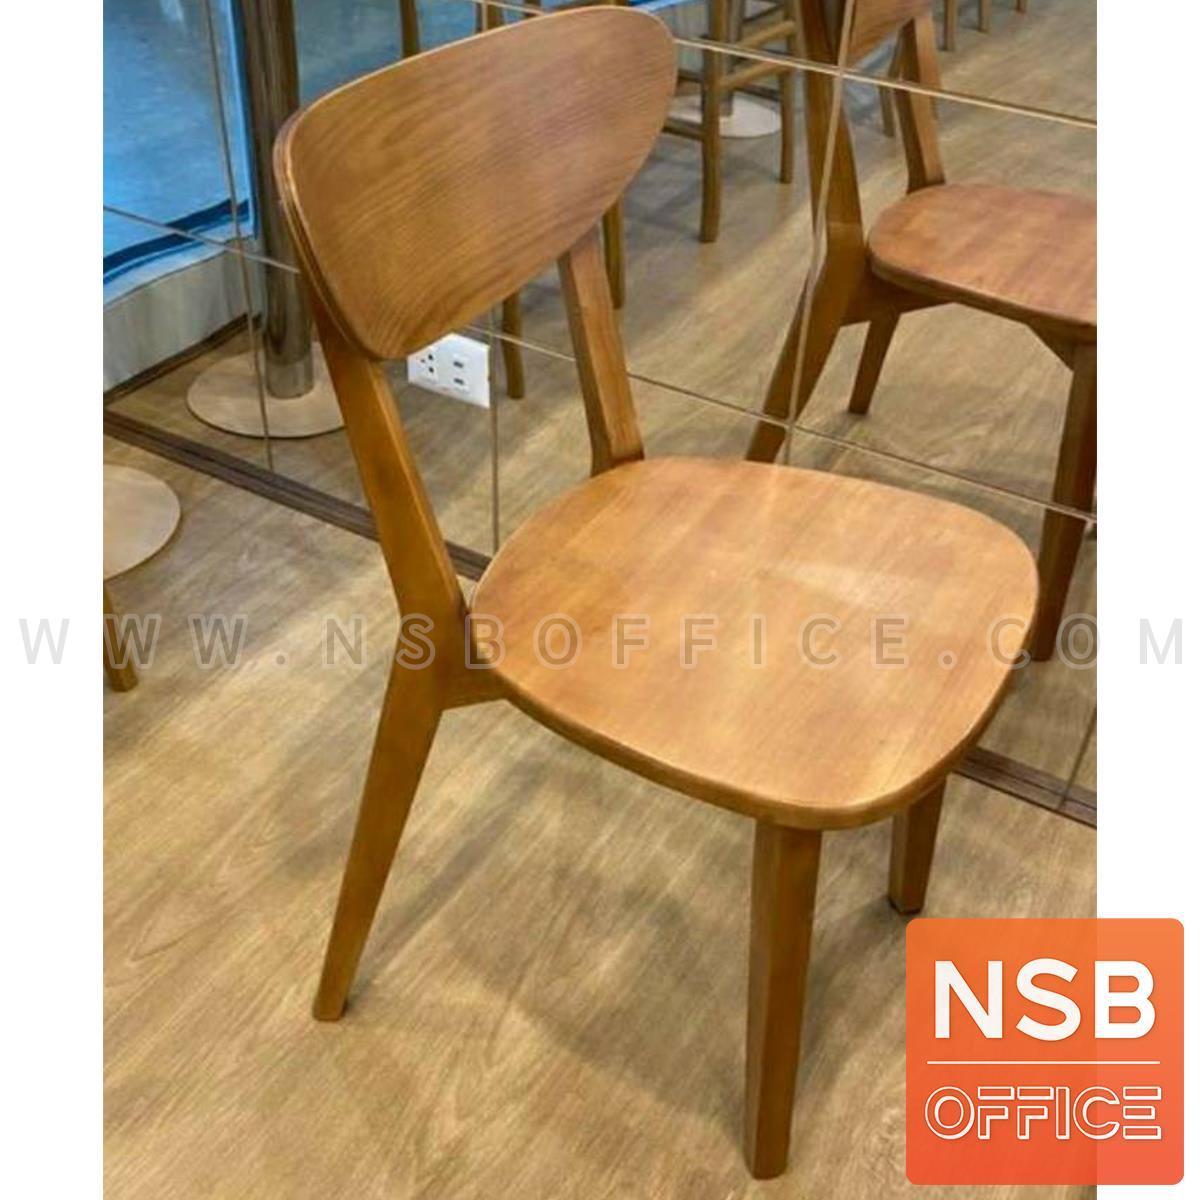 B22A194:เก้าอี้รับประทานอาหาร ขาไม้จริง  รุ่น Brownstone (บลาวน์สโตน)  ที่นั่งไม้ยางพารา